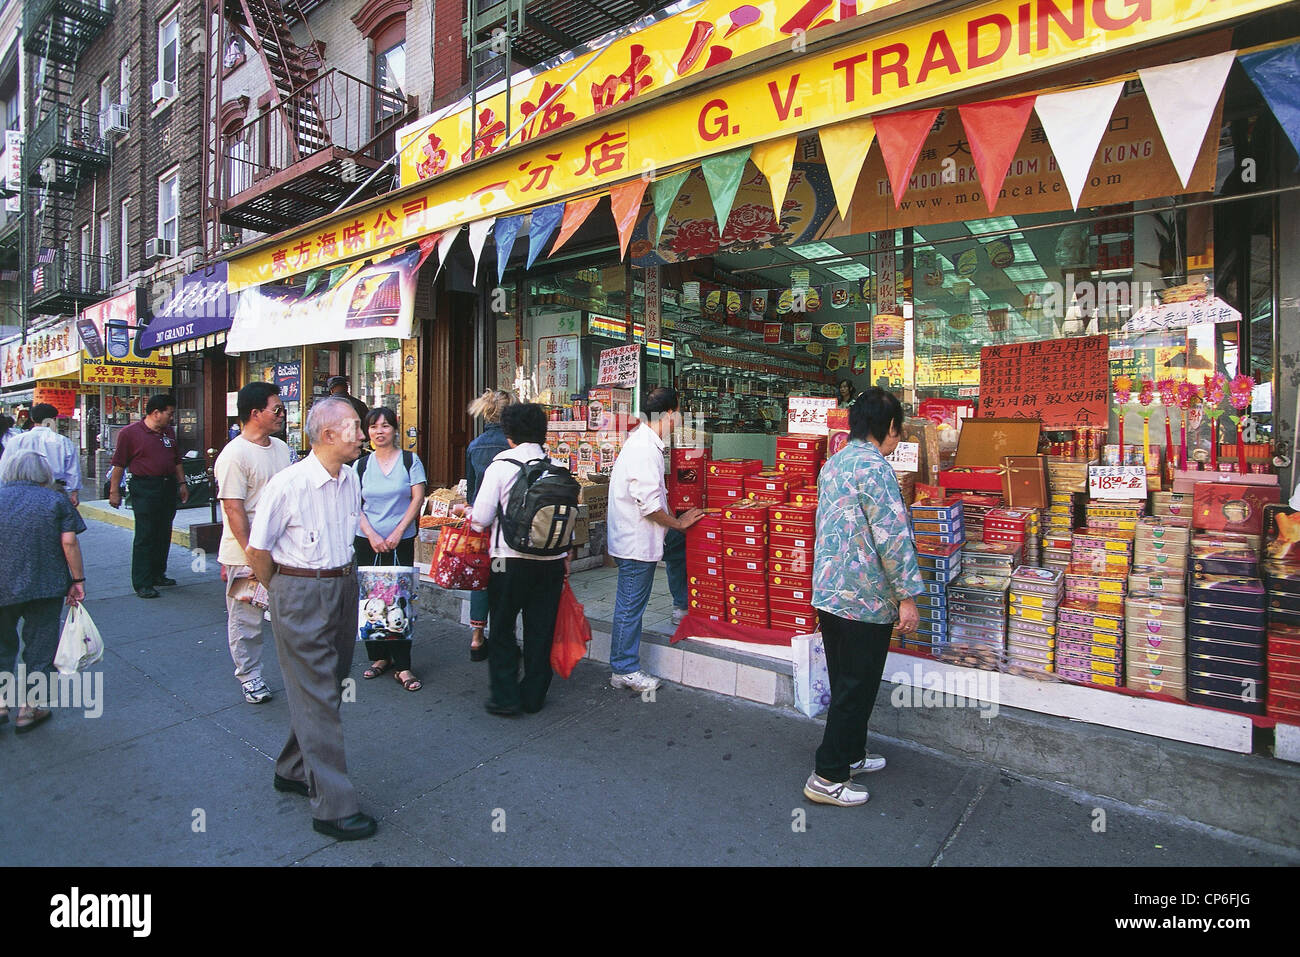 Chinese Street Food Cart